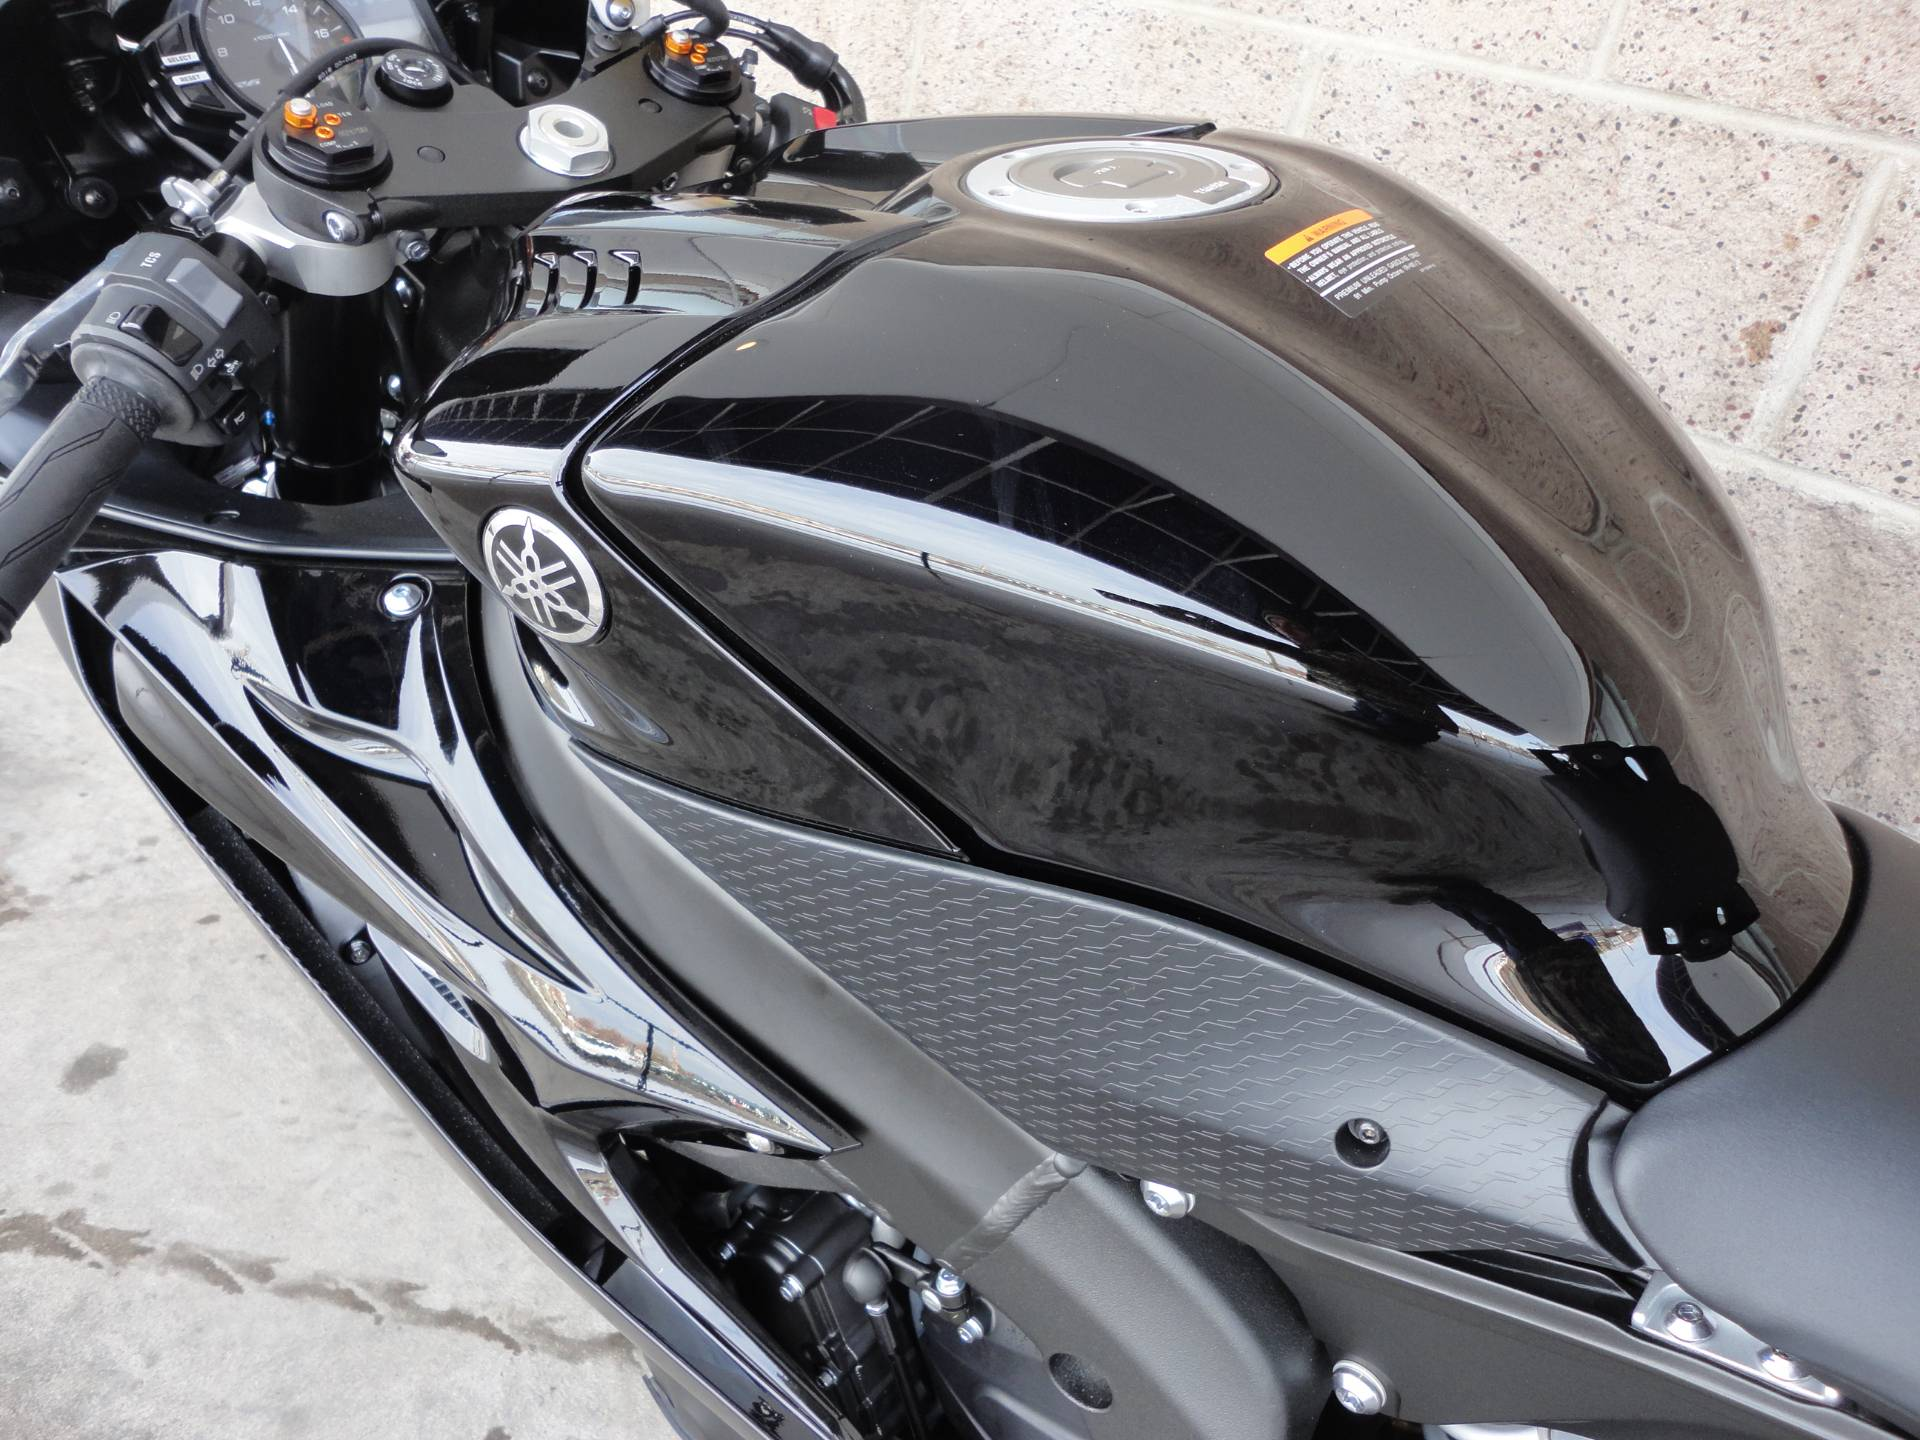 2020 Yamaha YZF-R6 11